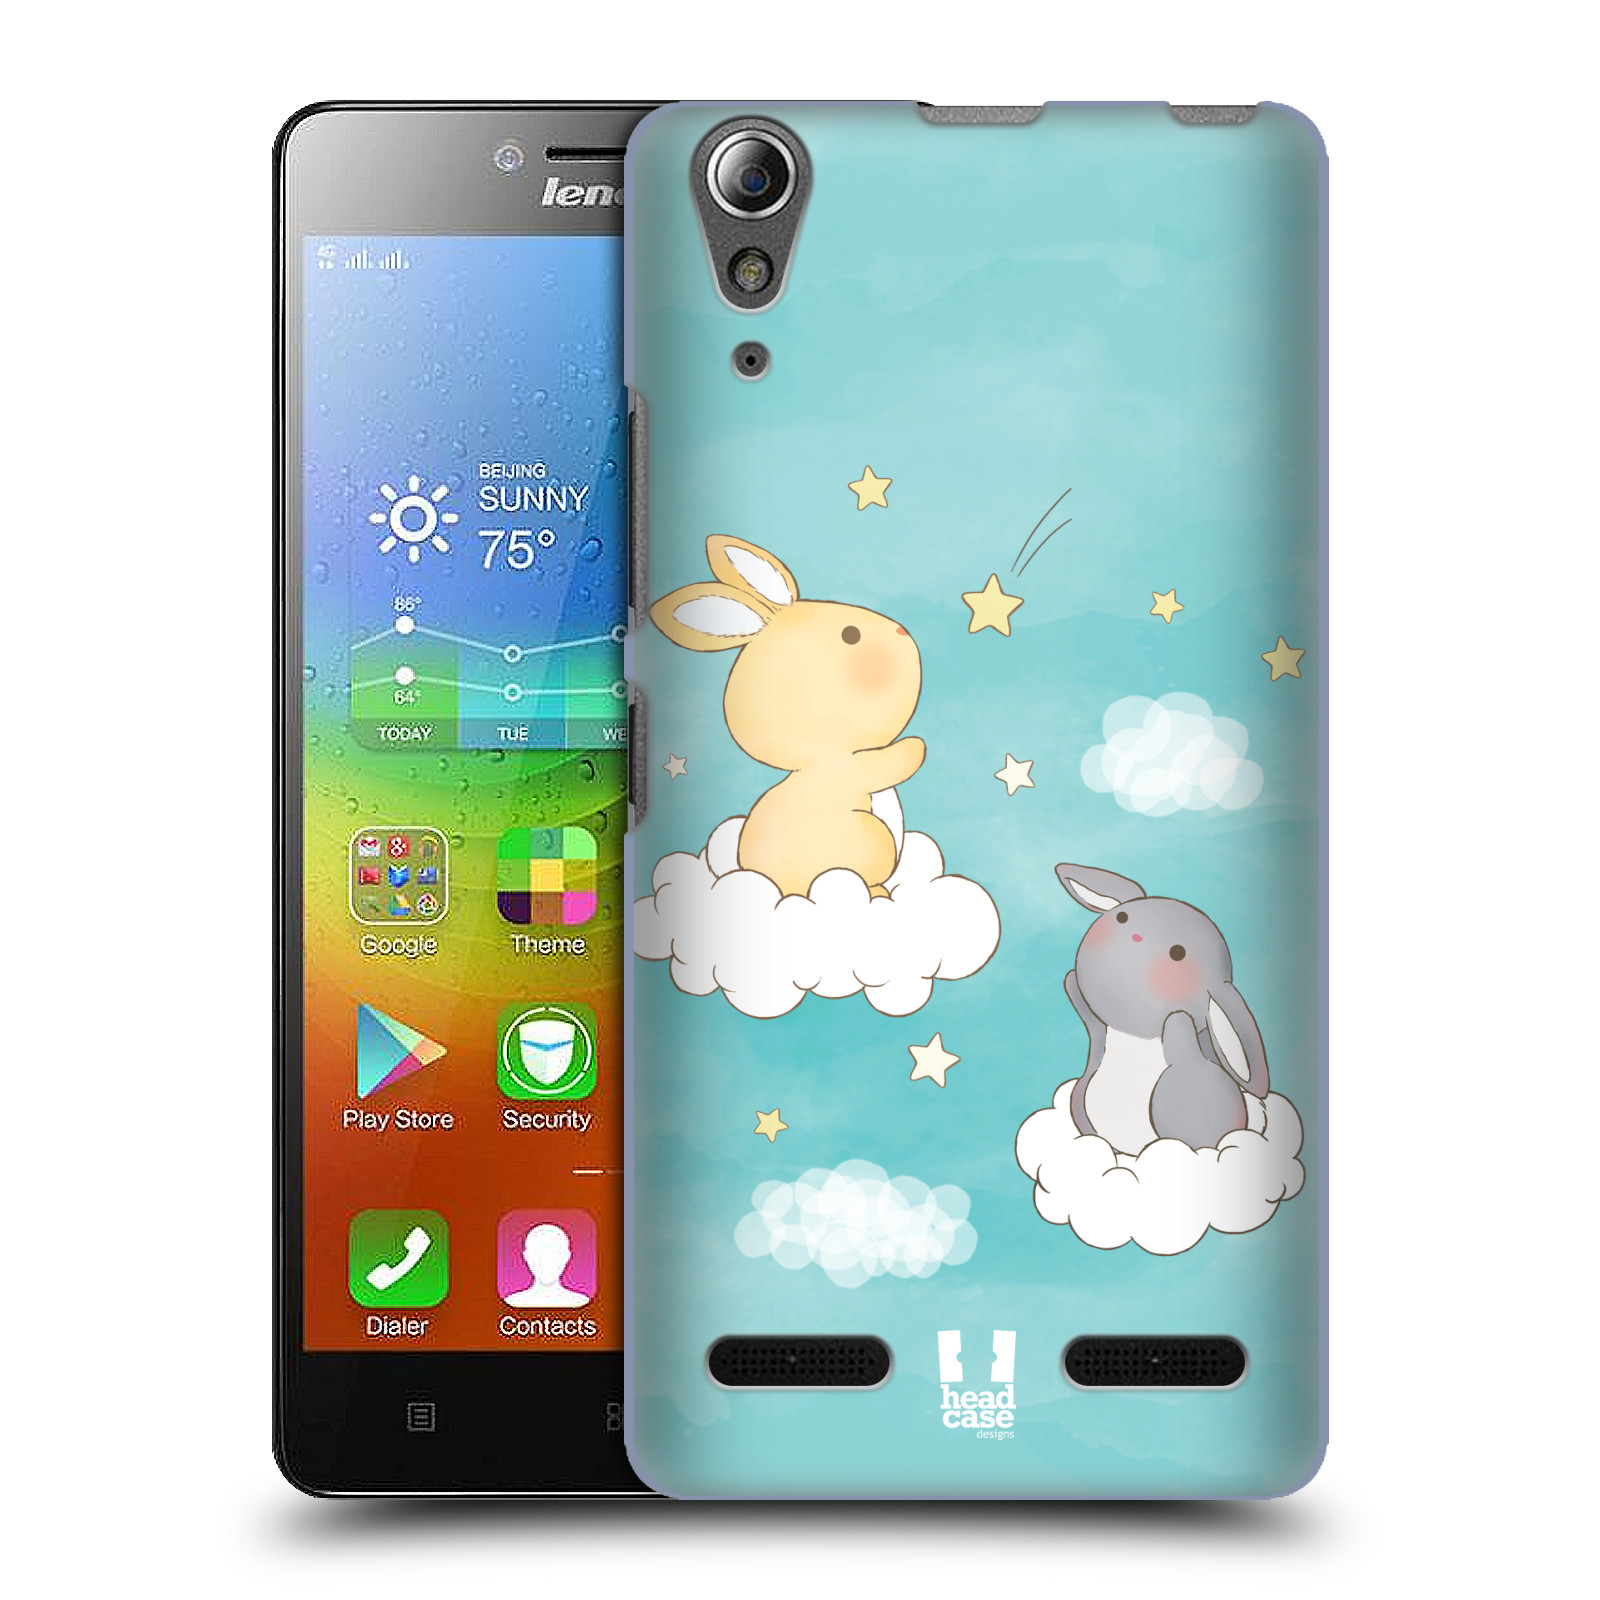 HEAD CASE pevný plastový obal na mobil LENOVO A6000 / A6000 PLUS vzor králíček a hvězdy modrá